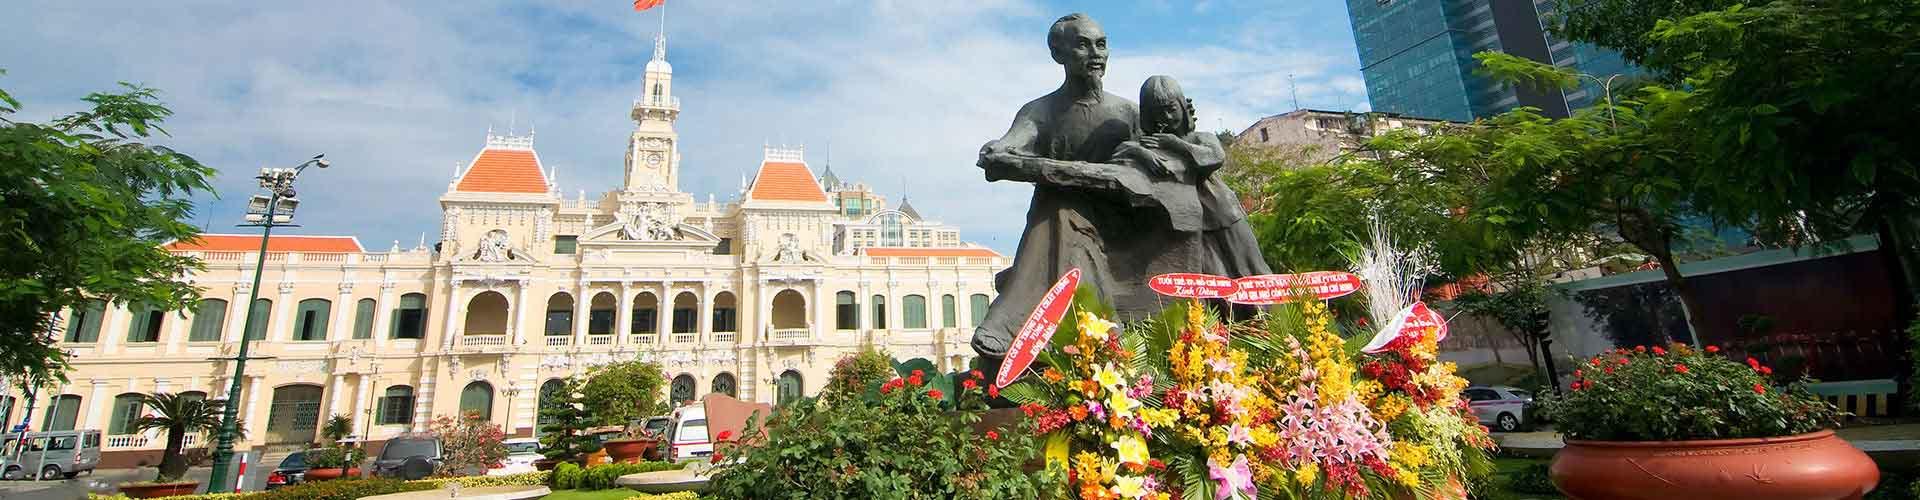 Hồ Chí Minh – Hostellit kohteessa Hồ Chí Minh. Hồ Chí Minh -karttoja, valokuvia ja arvosteluja kaikista Hồ Chí Minh -hostelleista.